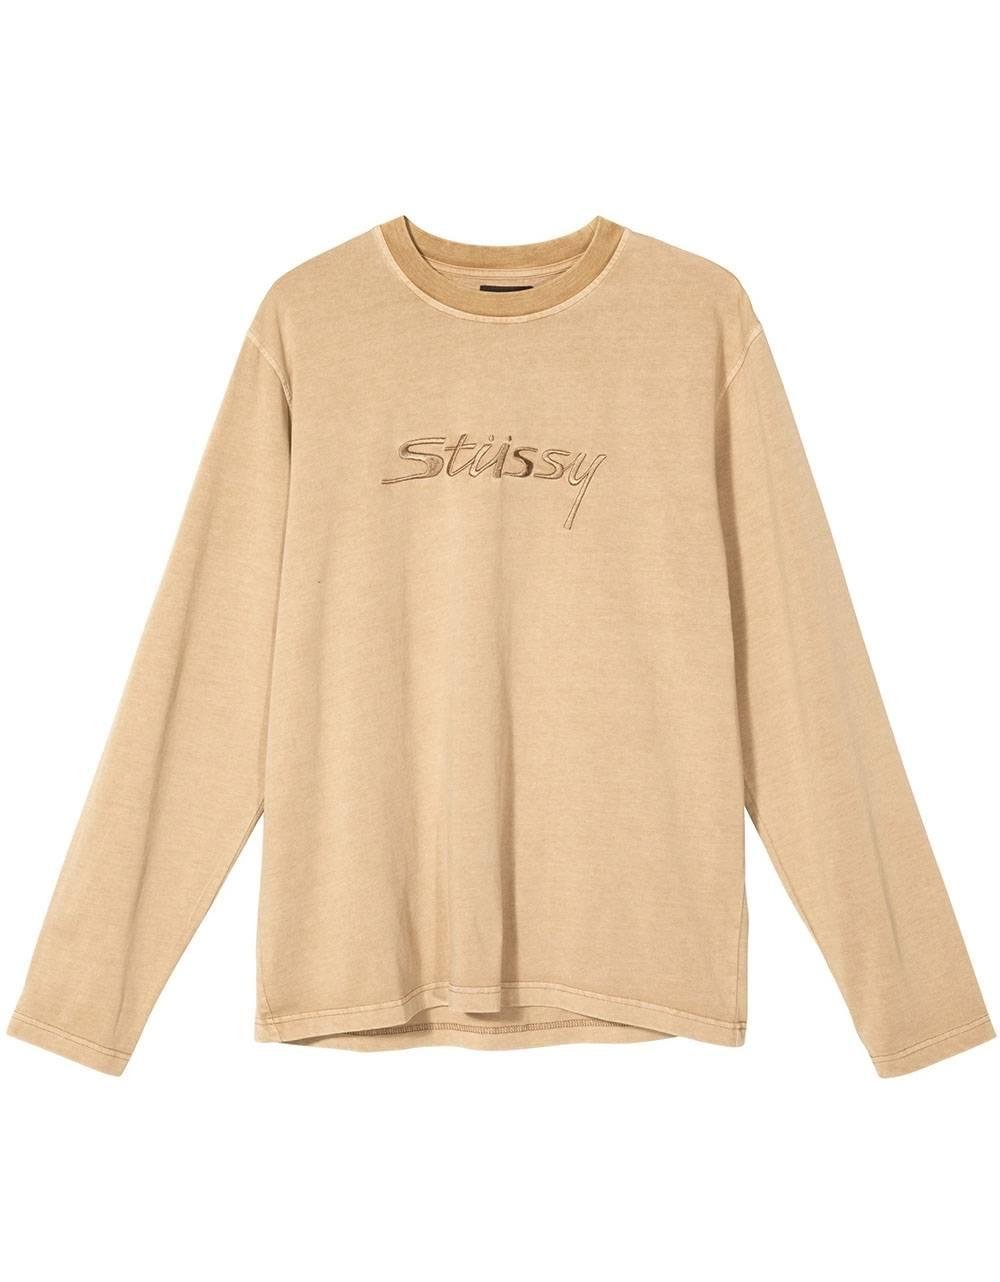 Stussy River longsleeve - khaki Stussy T-shirt 81,15€